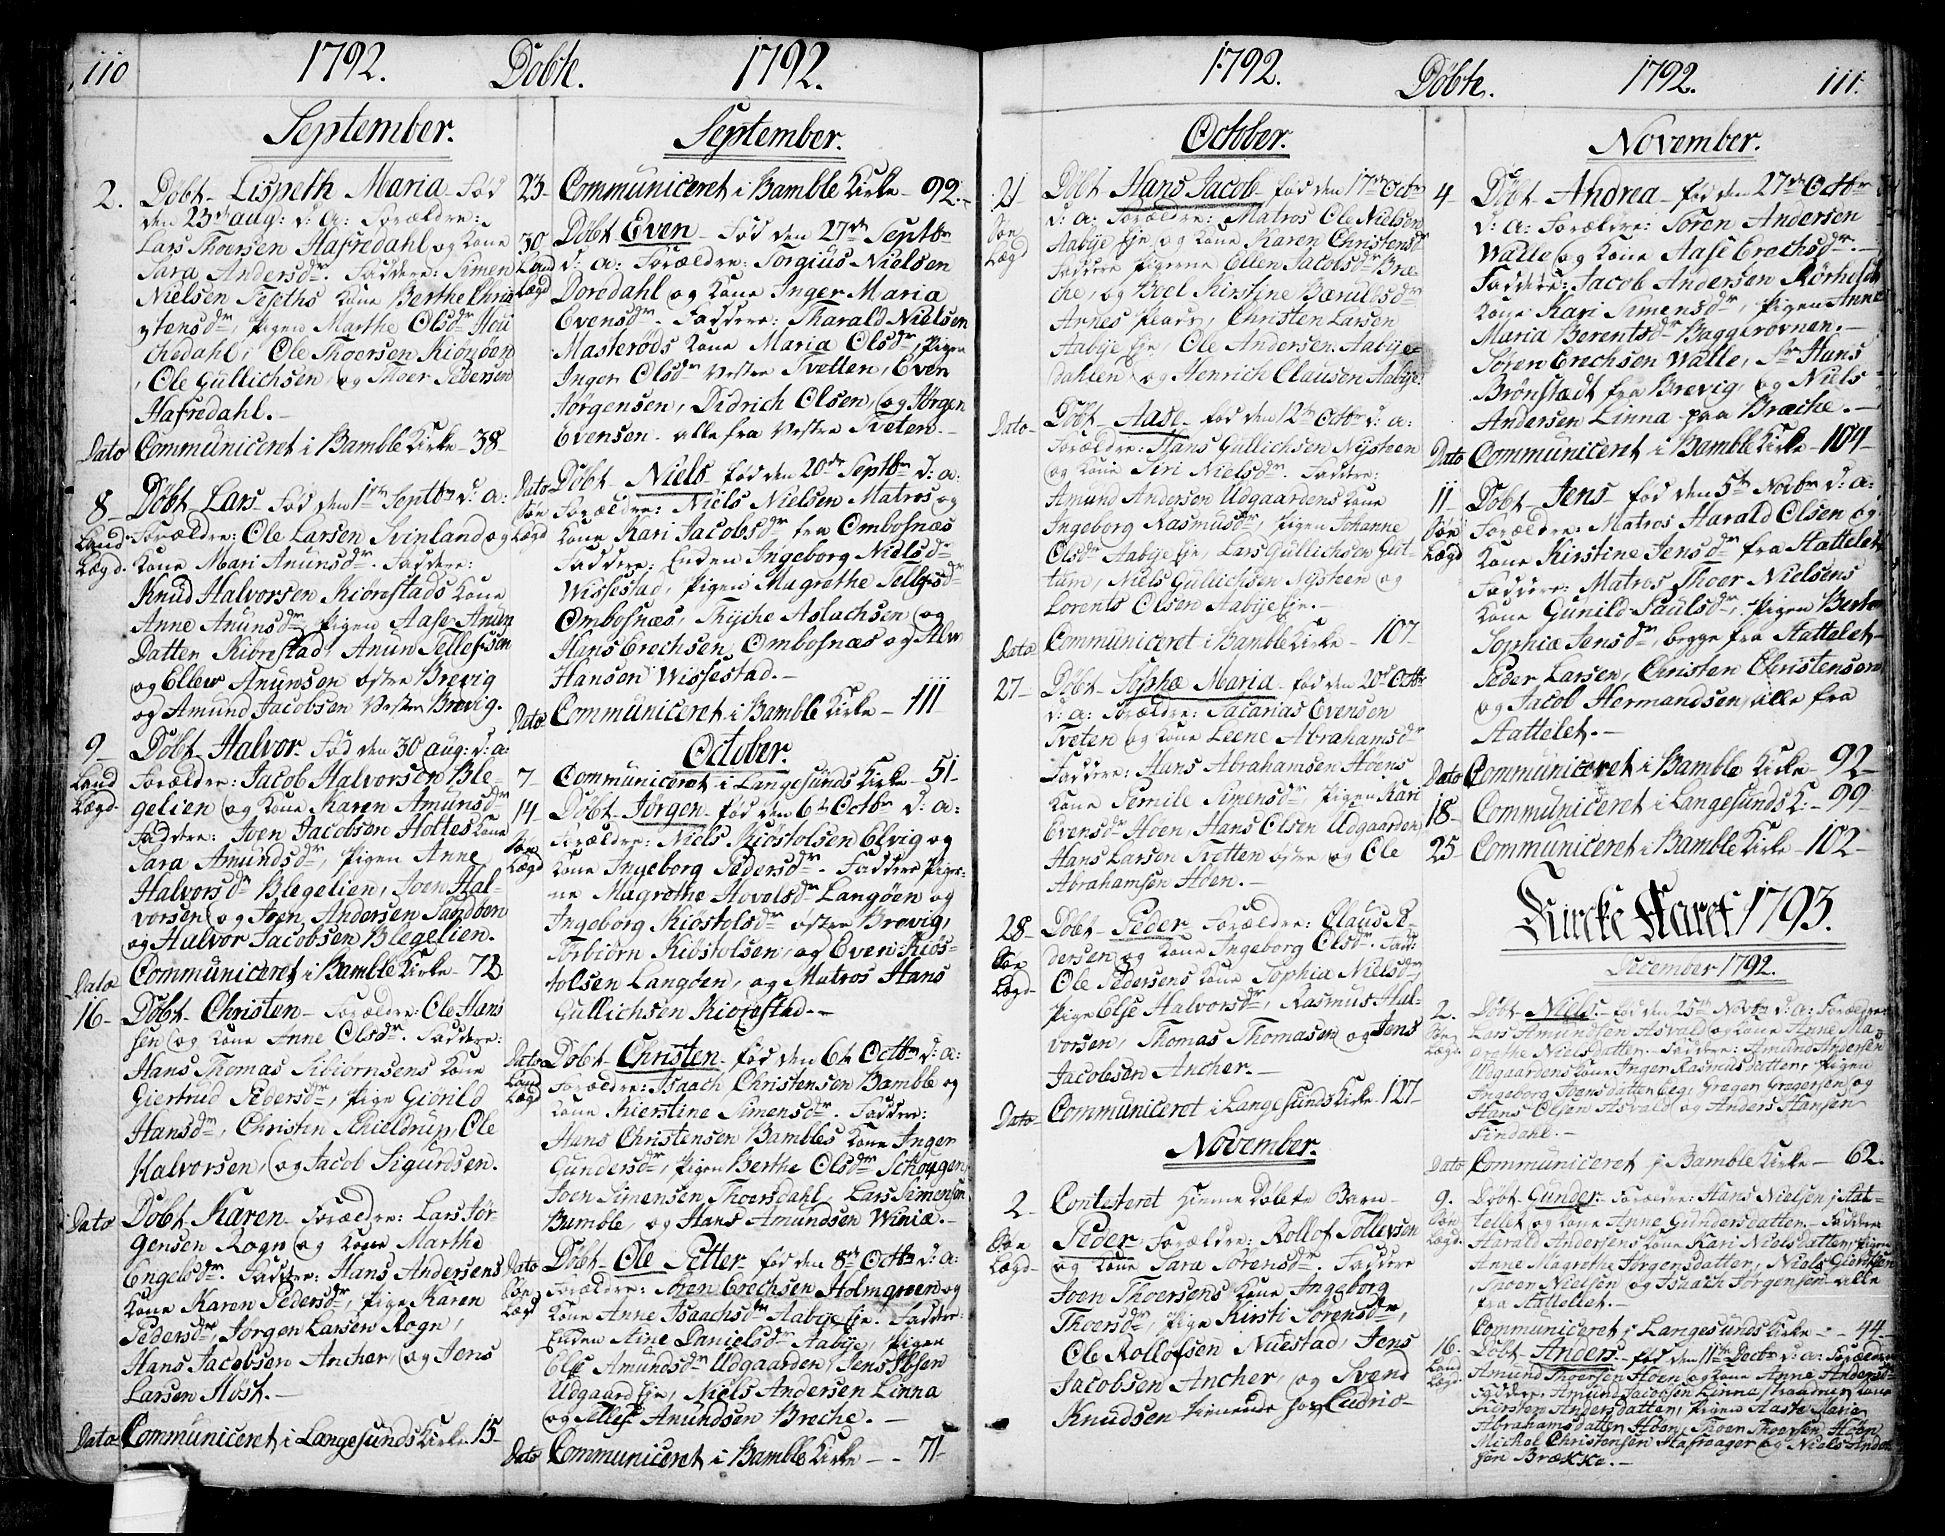 SAKO, Bamble kirkebøker, F/Fa/L0002: Ministerialbok nr. I 2, 1775-1814, s. 110-111